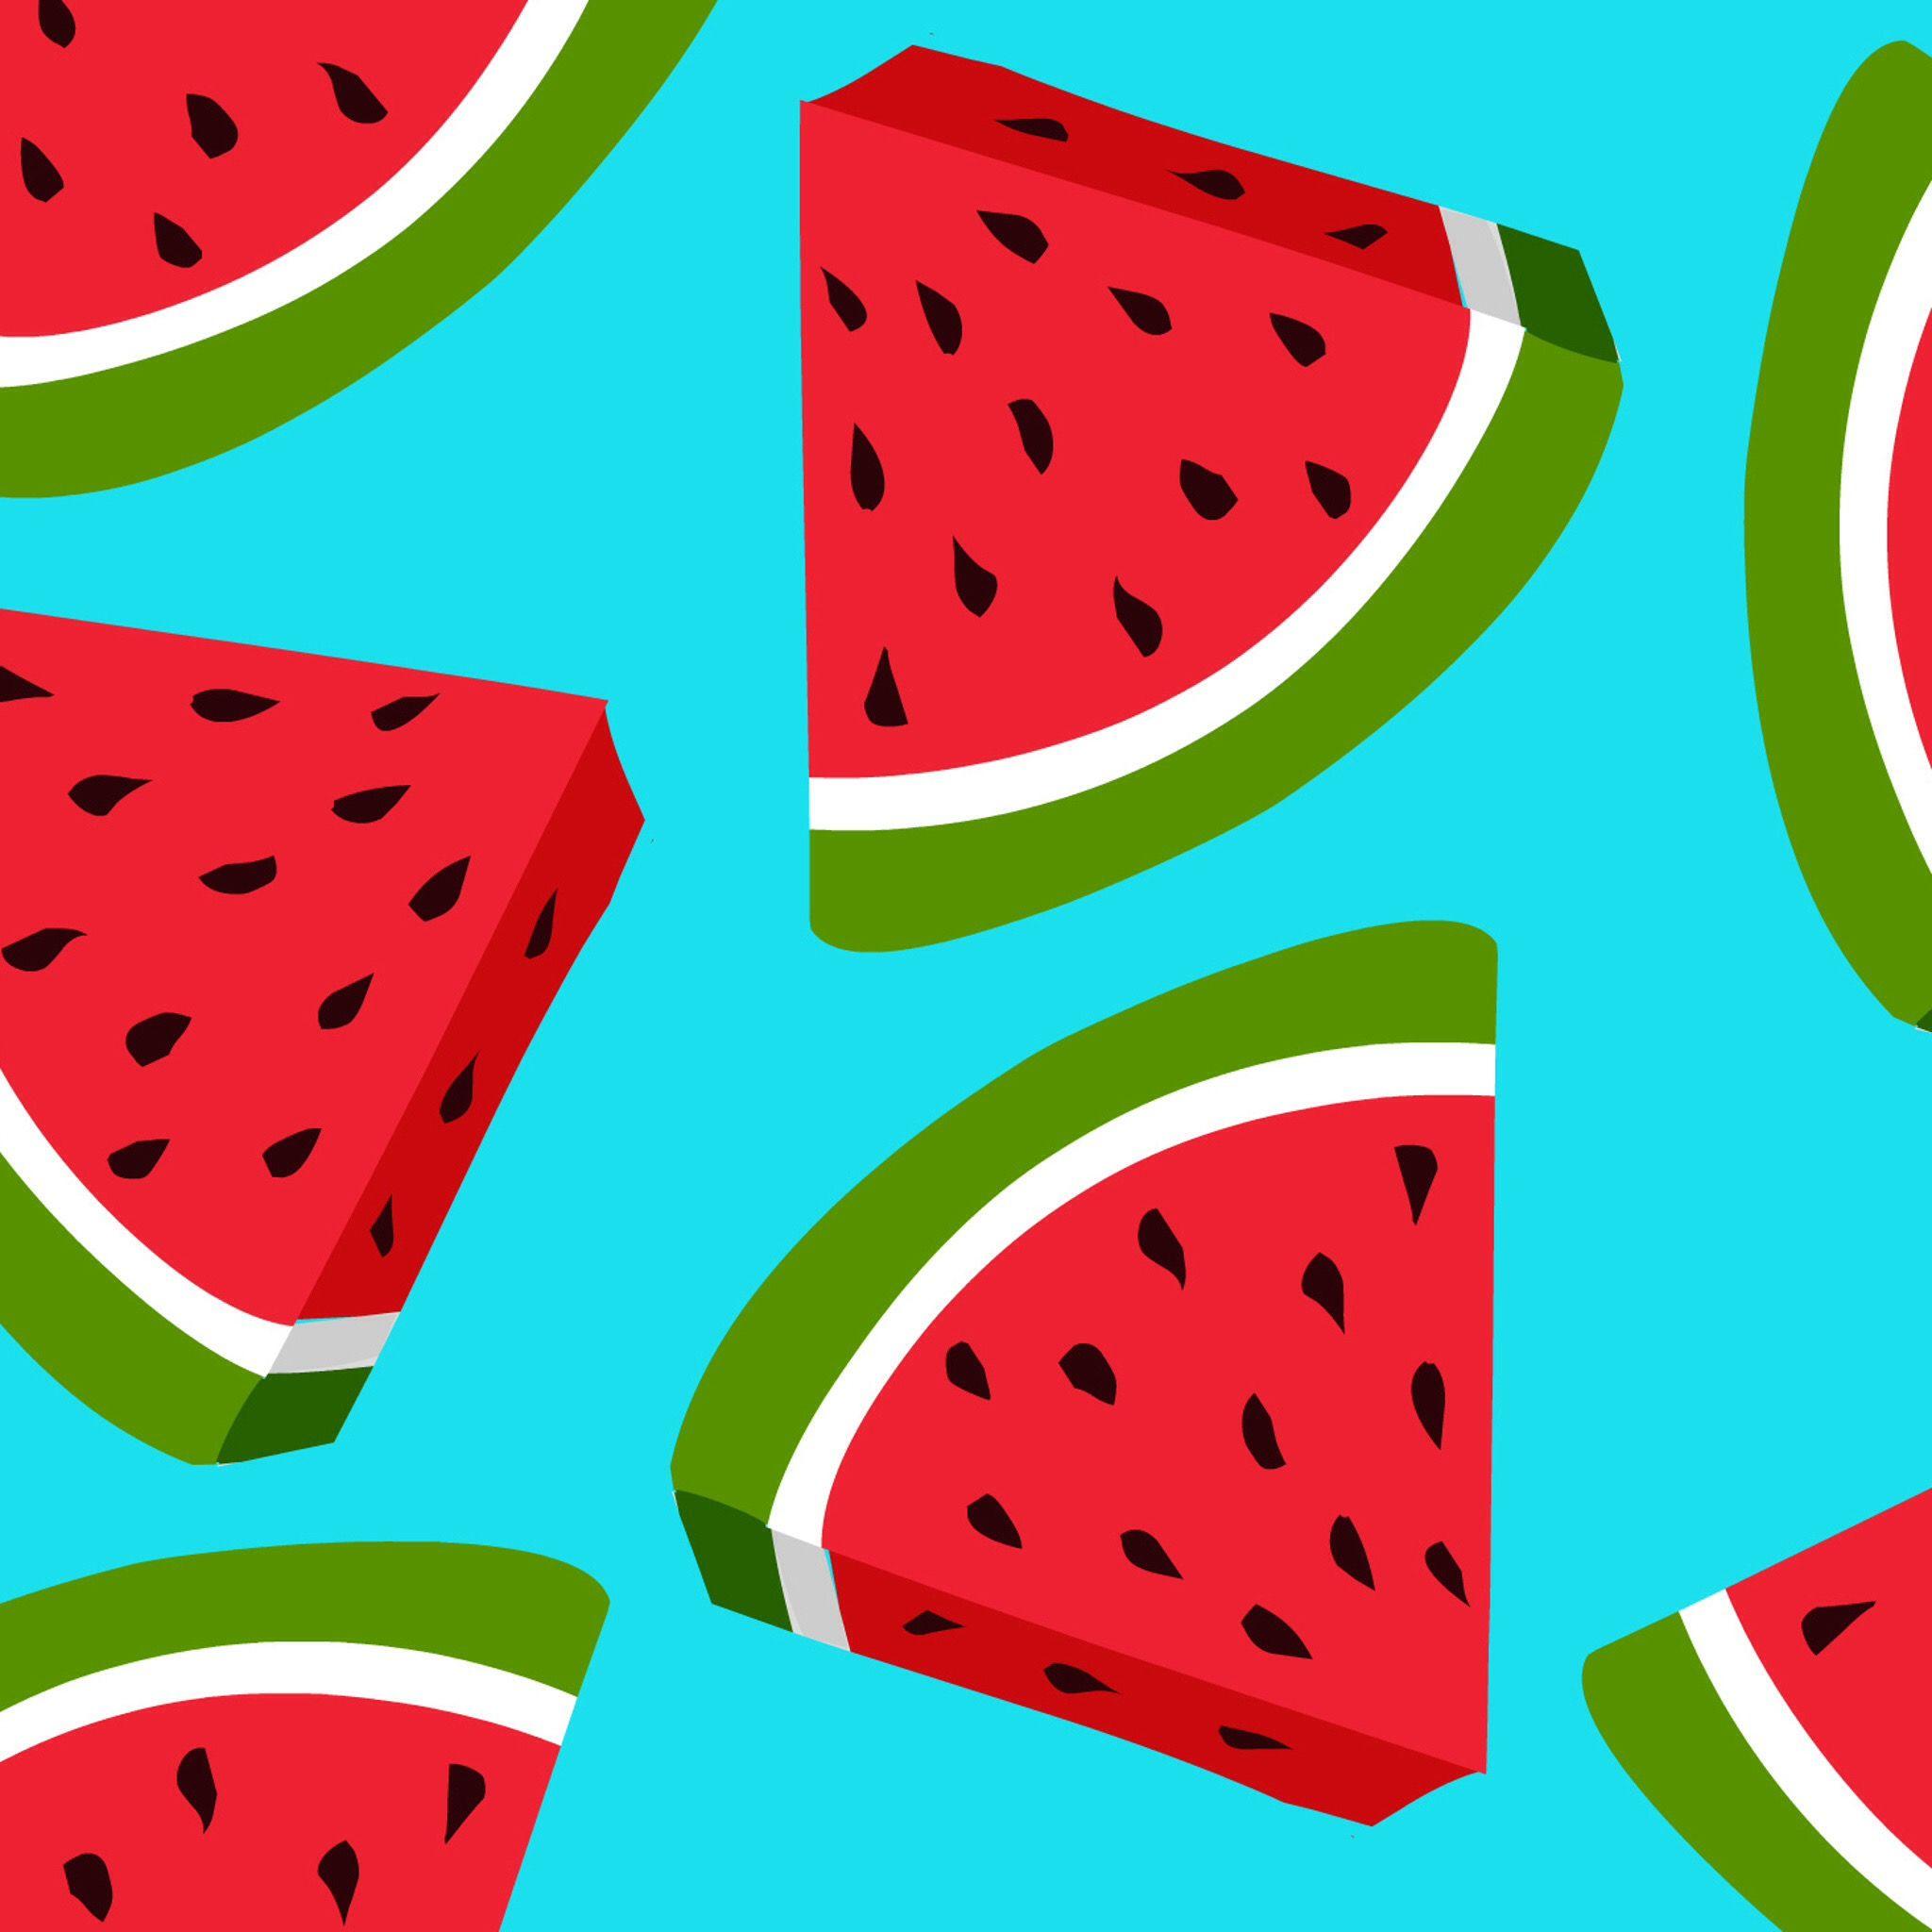 Pin by Cynthia Dempsey on Food Watermelon wallpaper